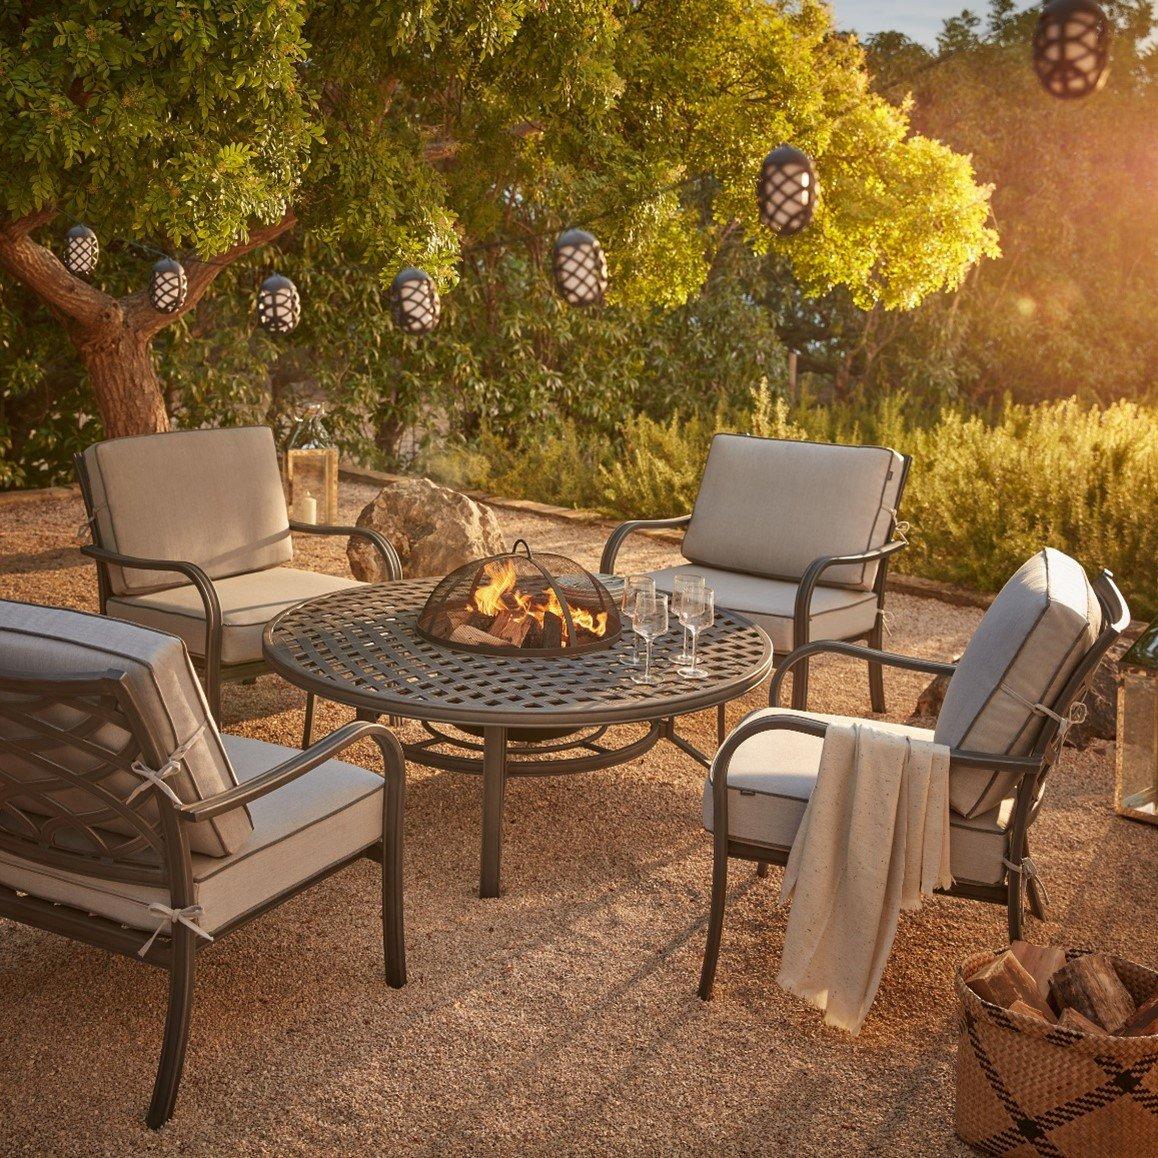 Garden seating around an outdoor fire